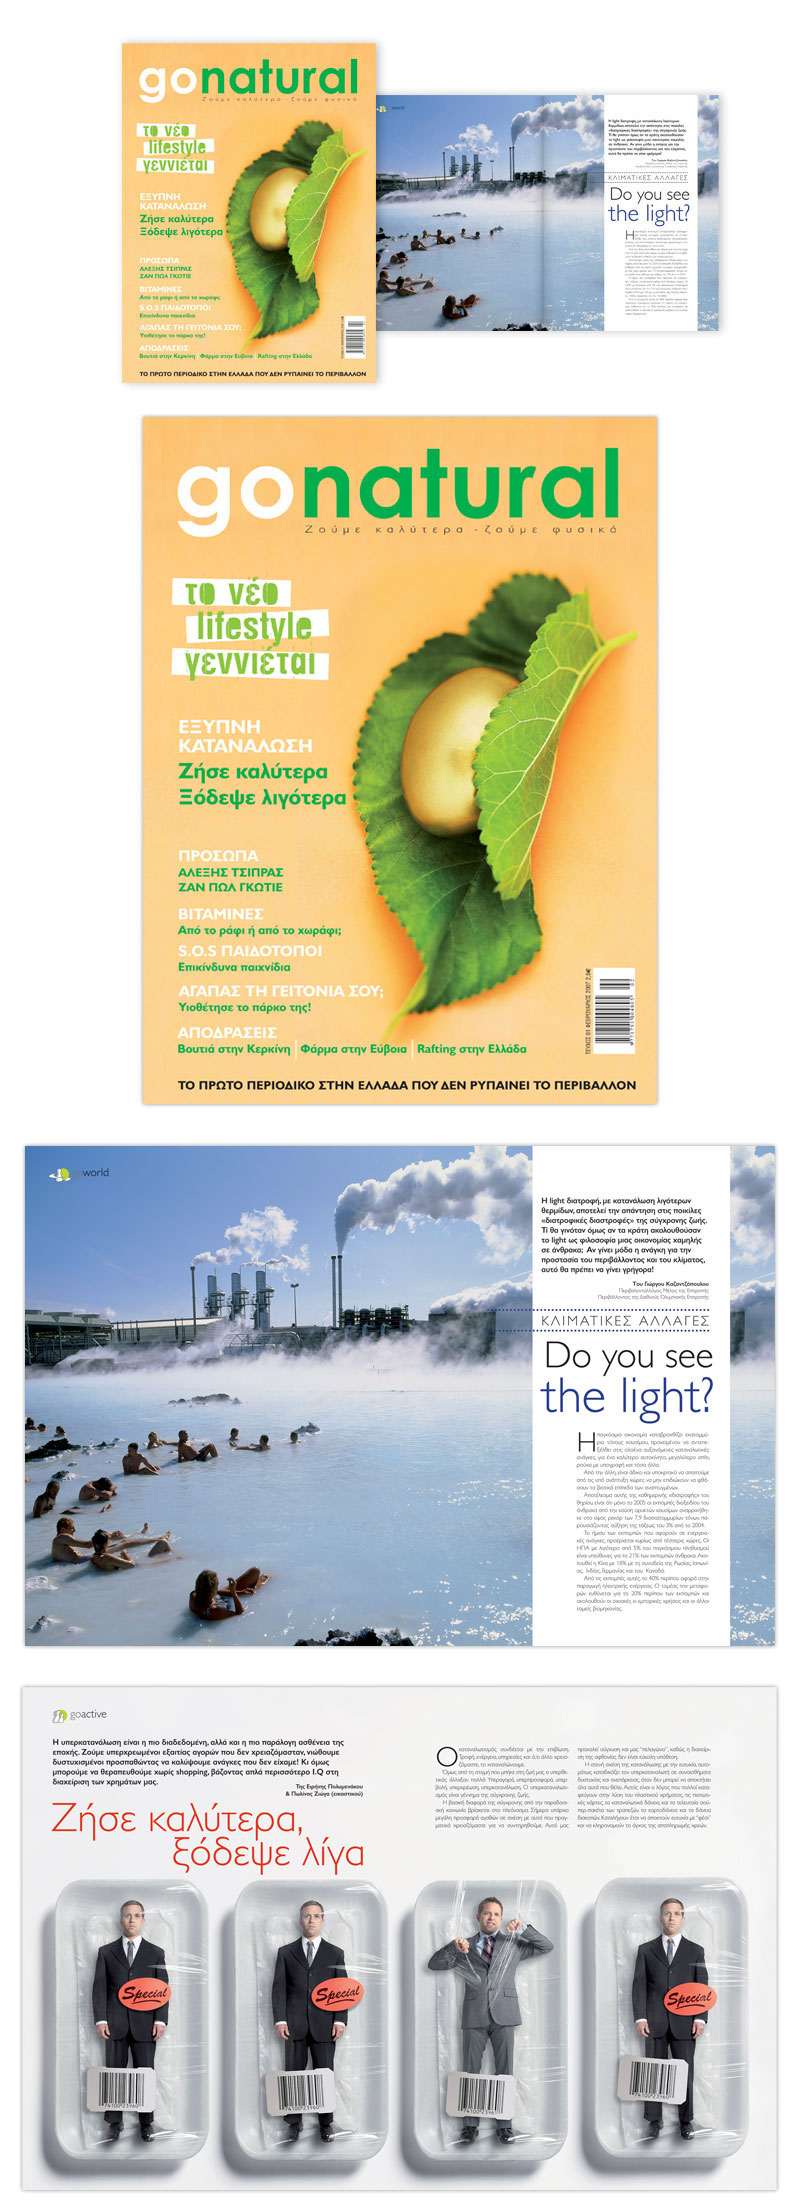 GoNatural_magazine1